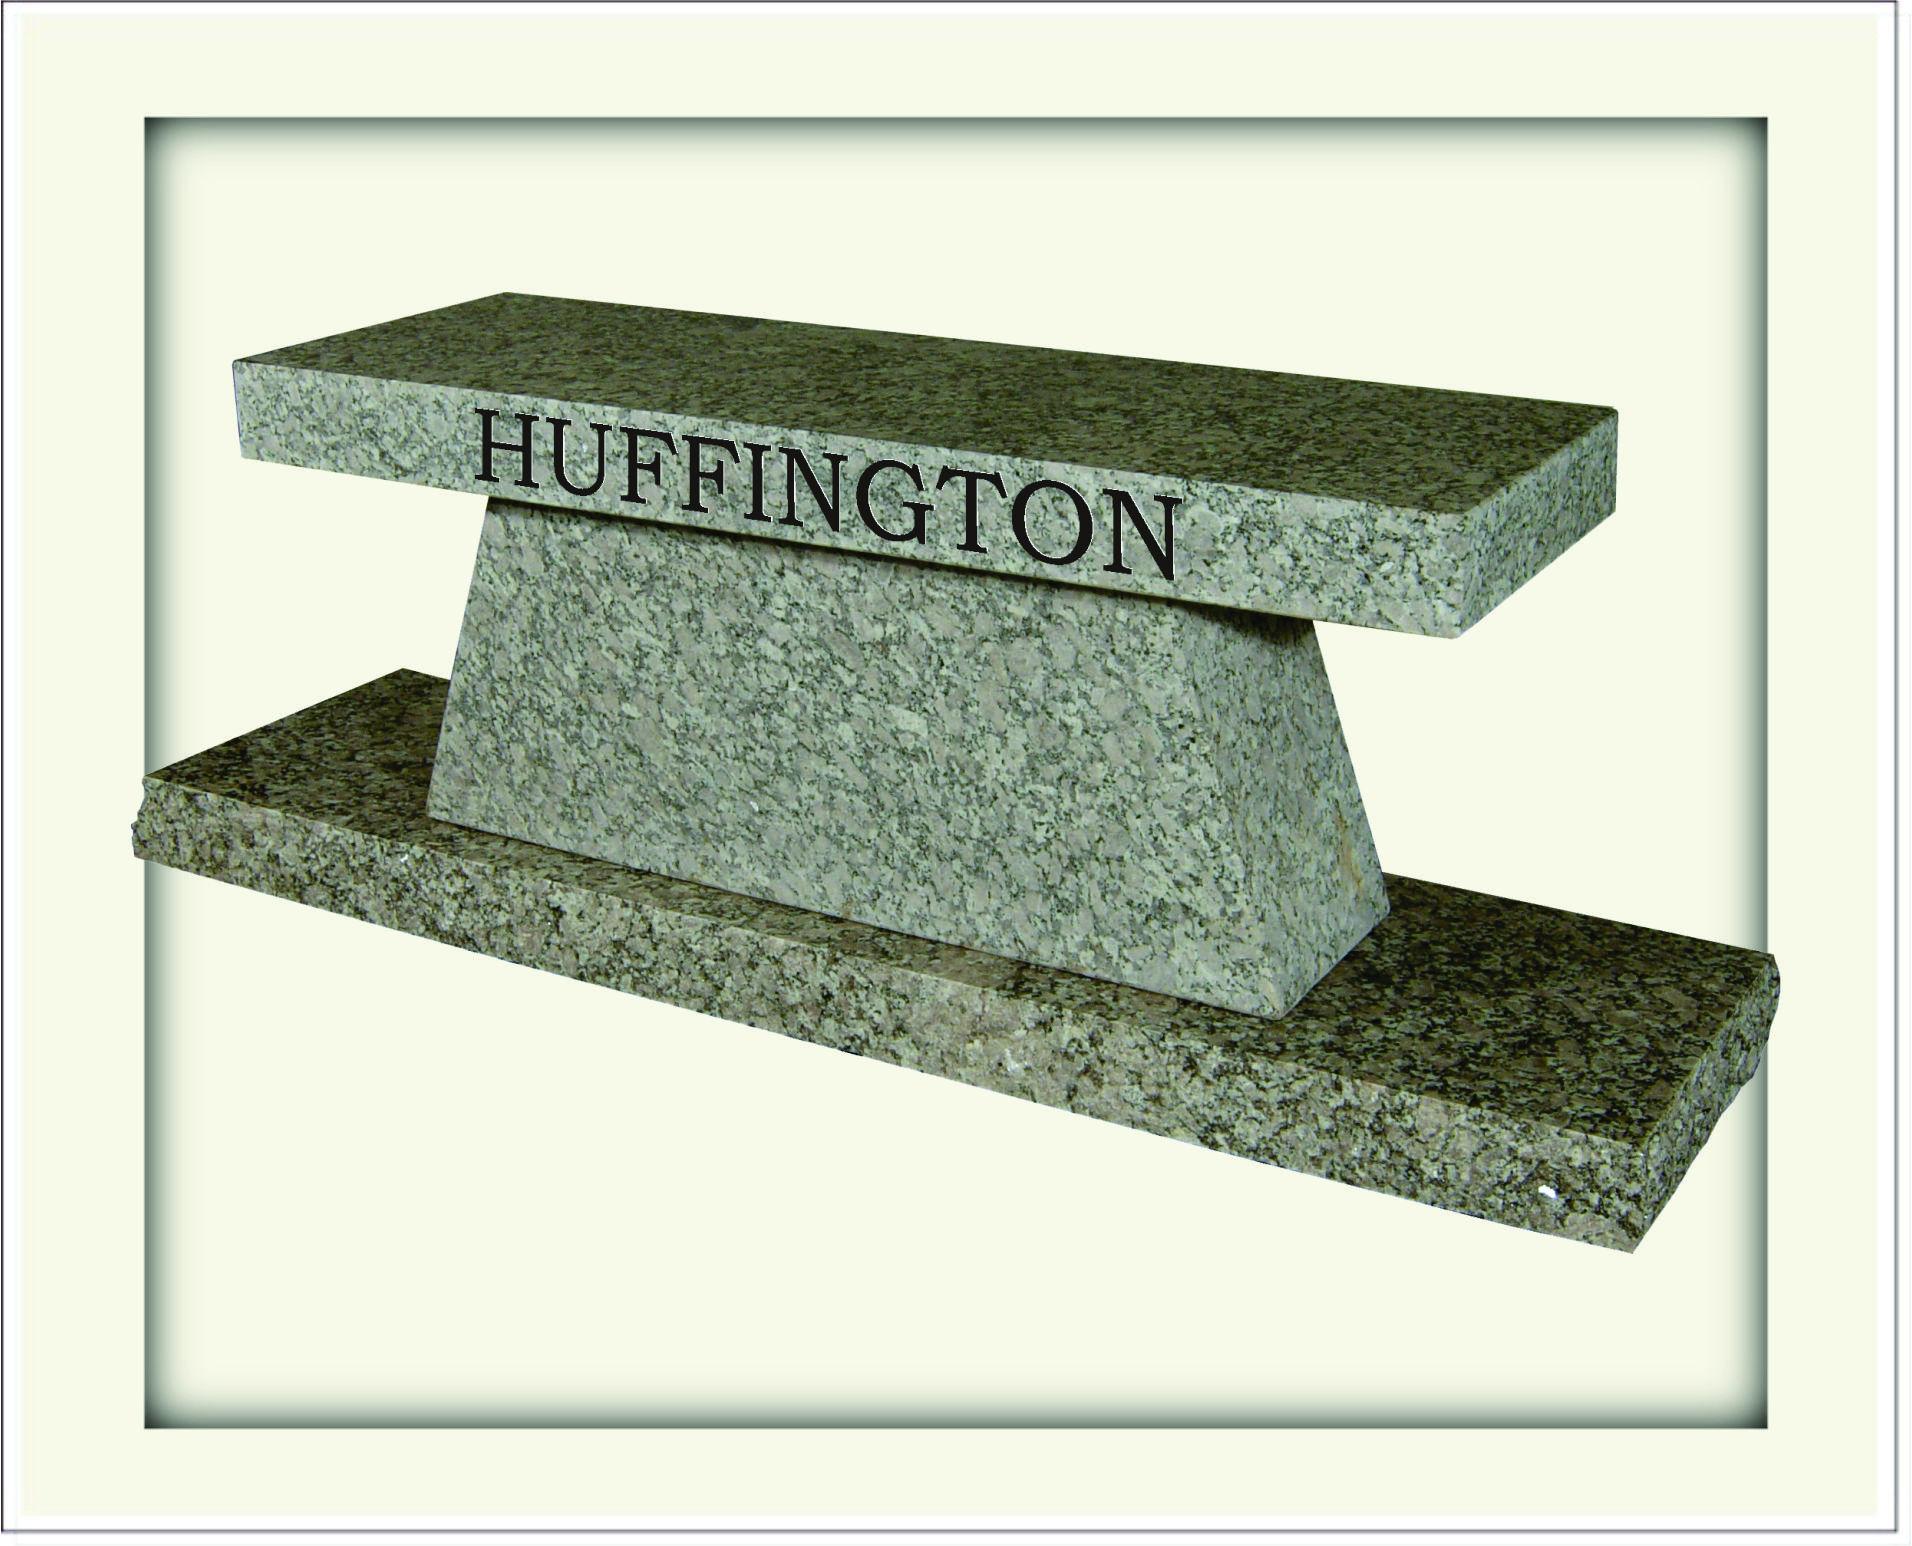 granite stone memorial bench collection